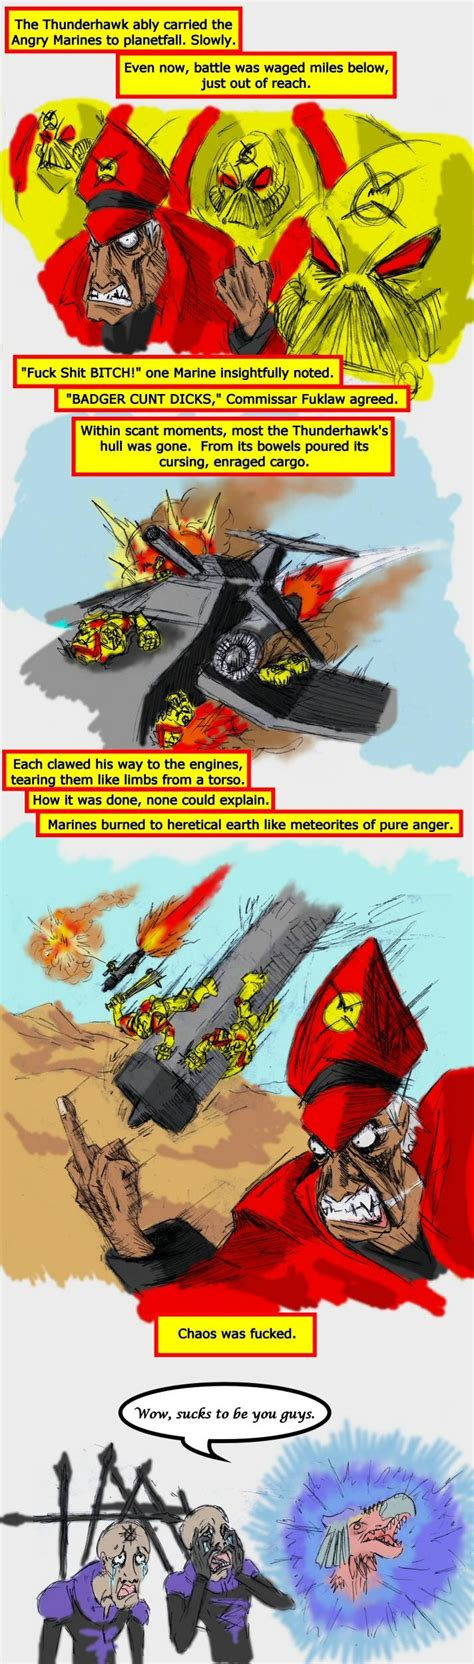 Angry Marines Meme - warhammer 40k memes page 178 warhammer 40 000 eternal crusade official forum